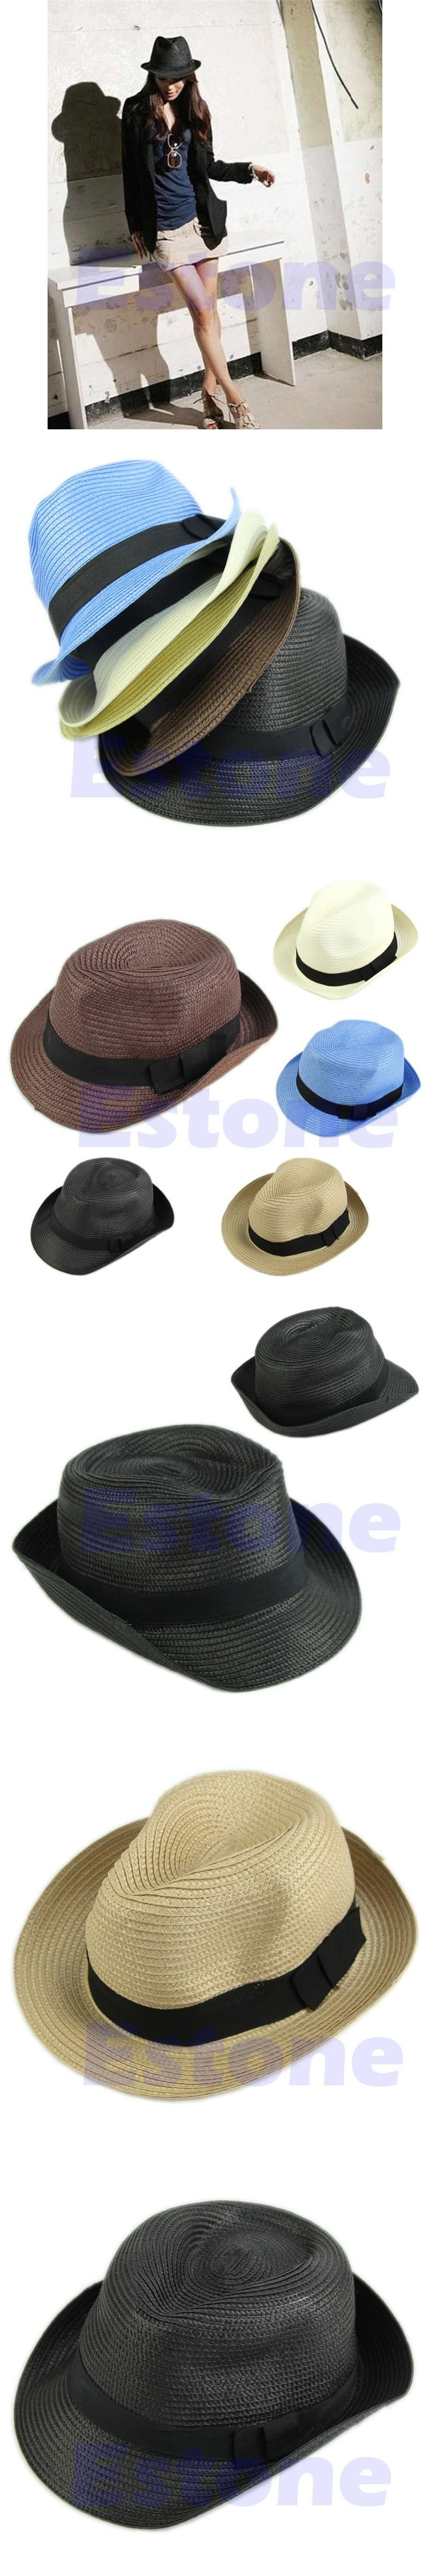 af31d356ef6e4 Women Men Summer Style Child Sun hat Beach Sunhat Fedora hat Trilby Straw  panama Hat boy